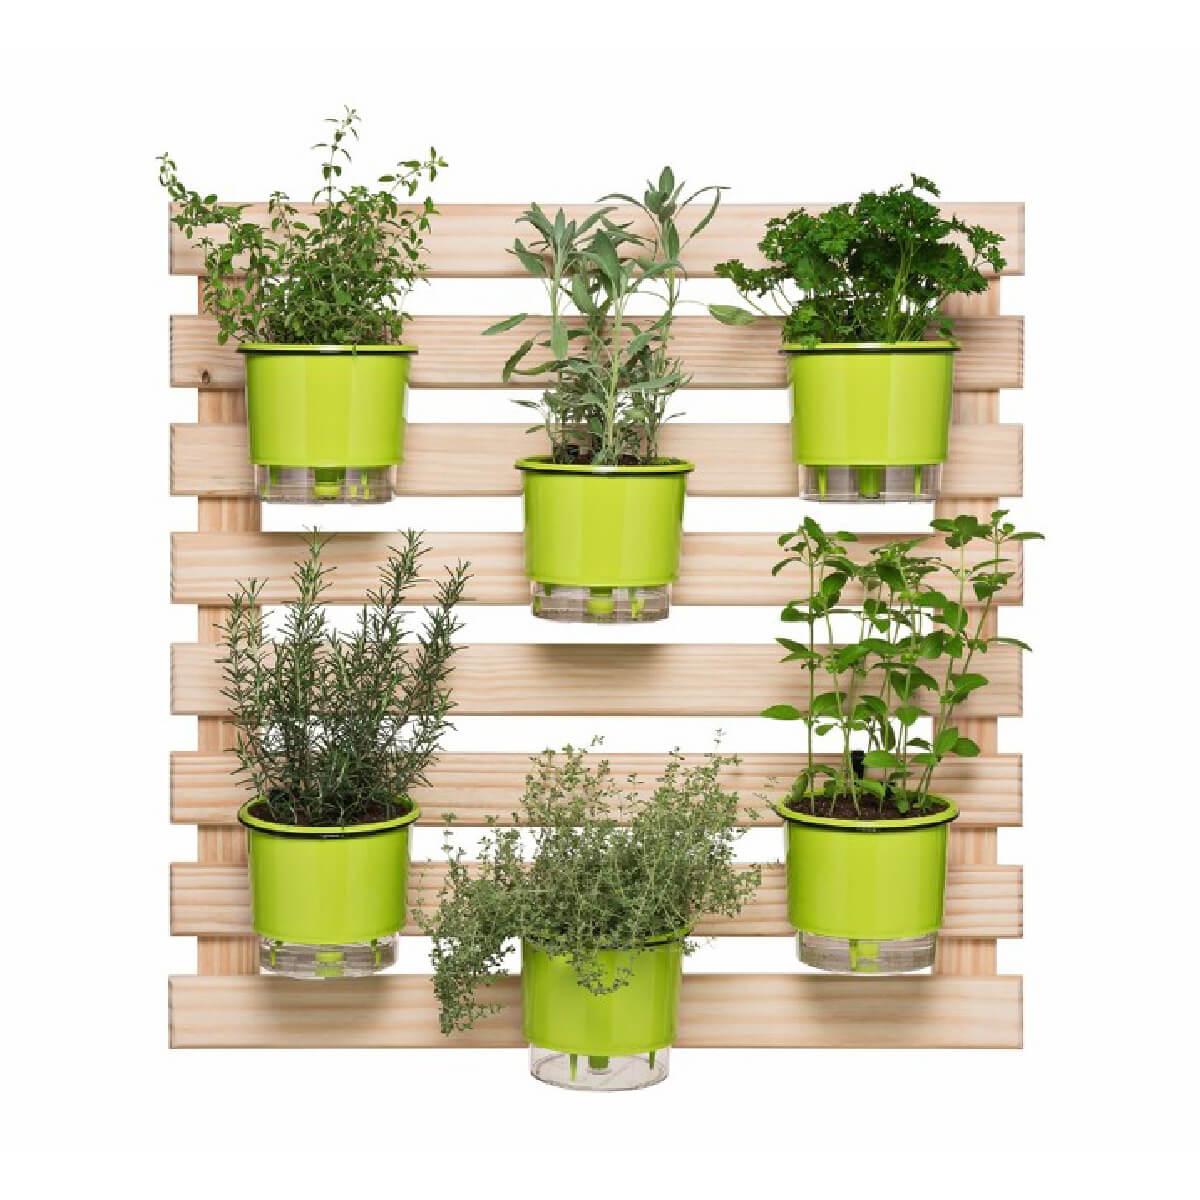 Kit Horta Vertical 80cm x 80cm com 6 Vasos Verde Claro  - Loja Raiz